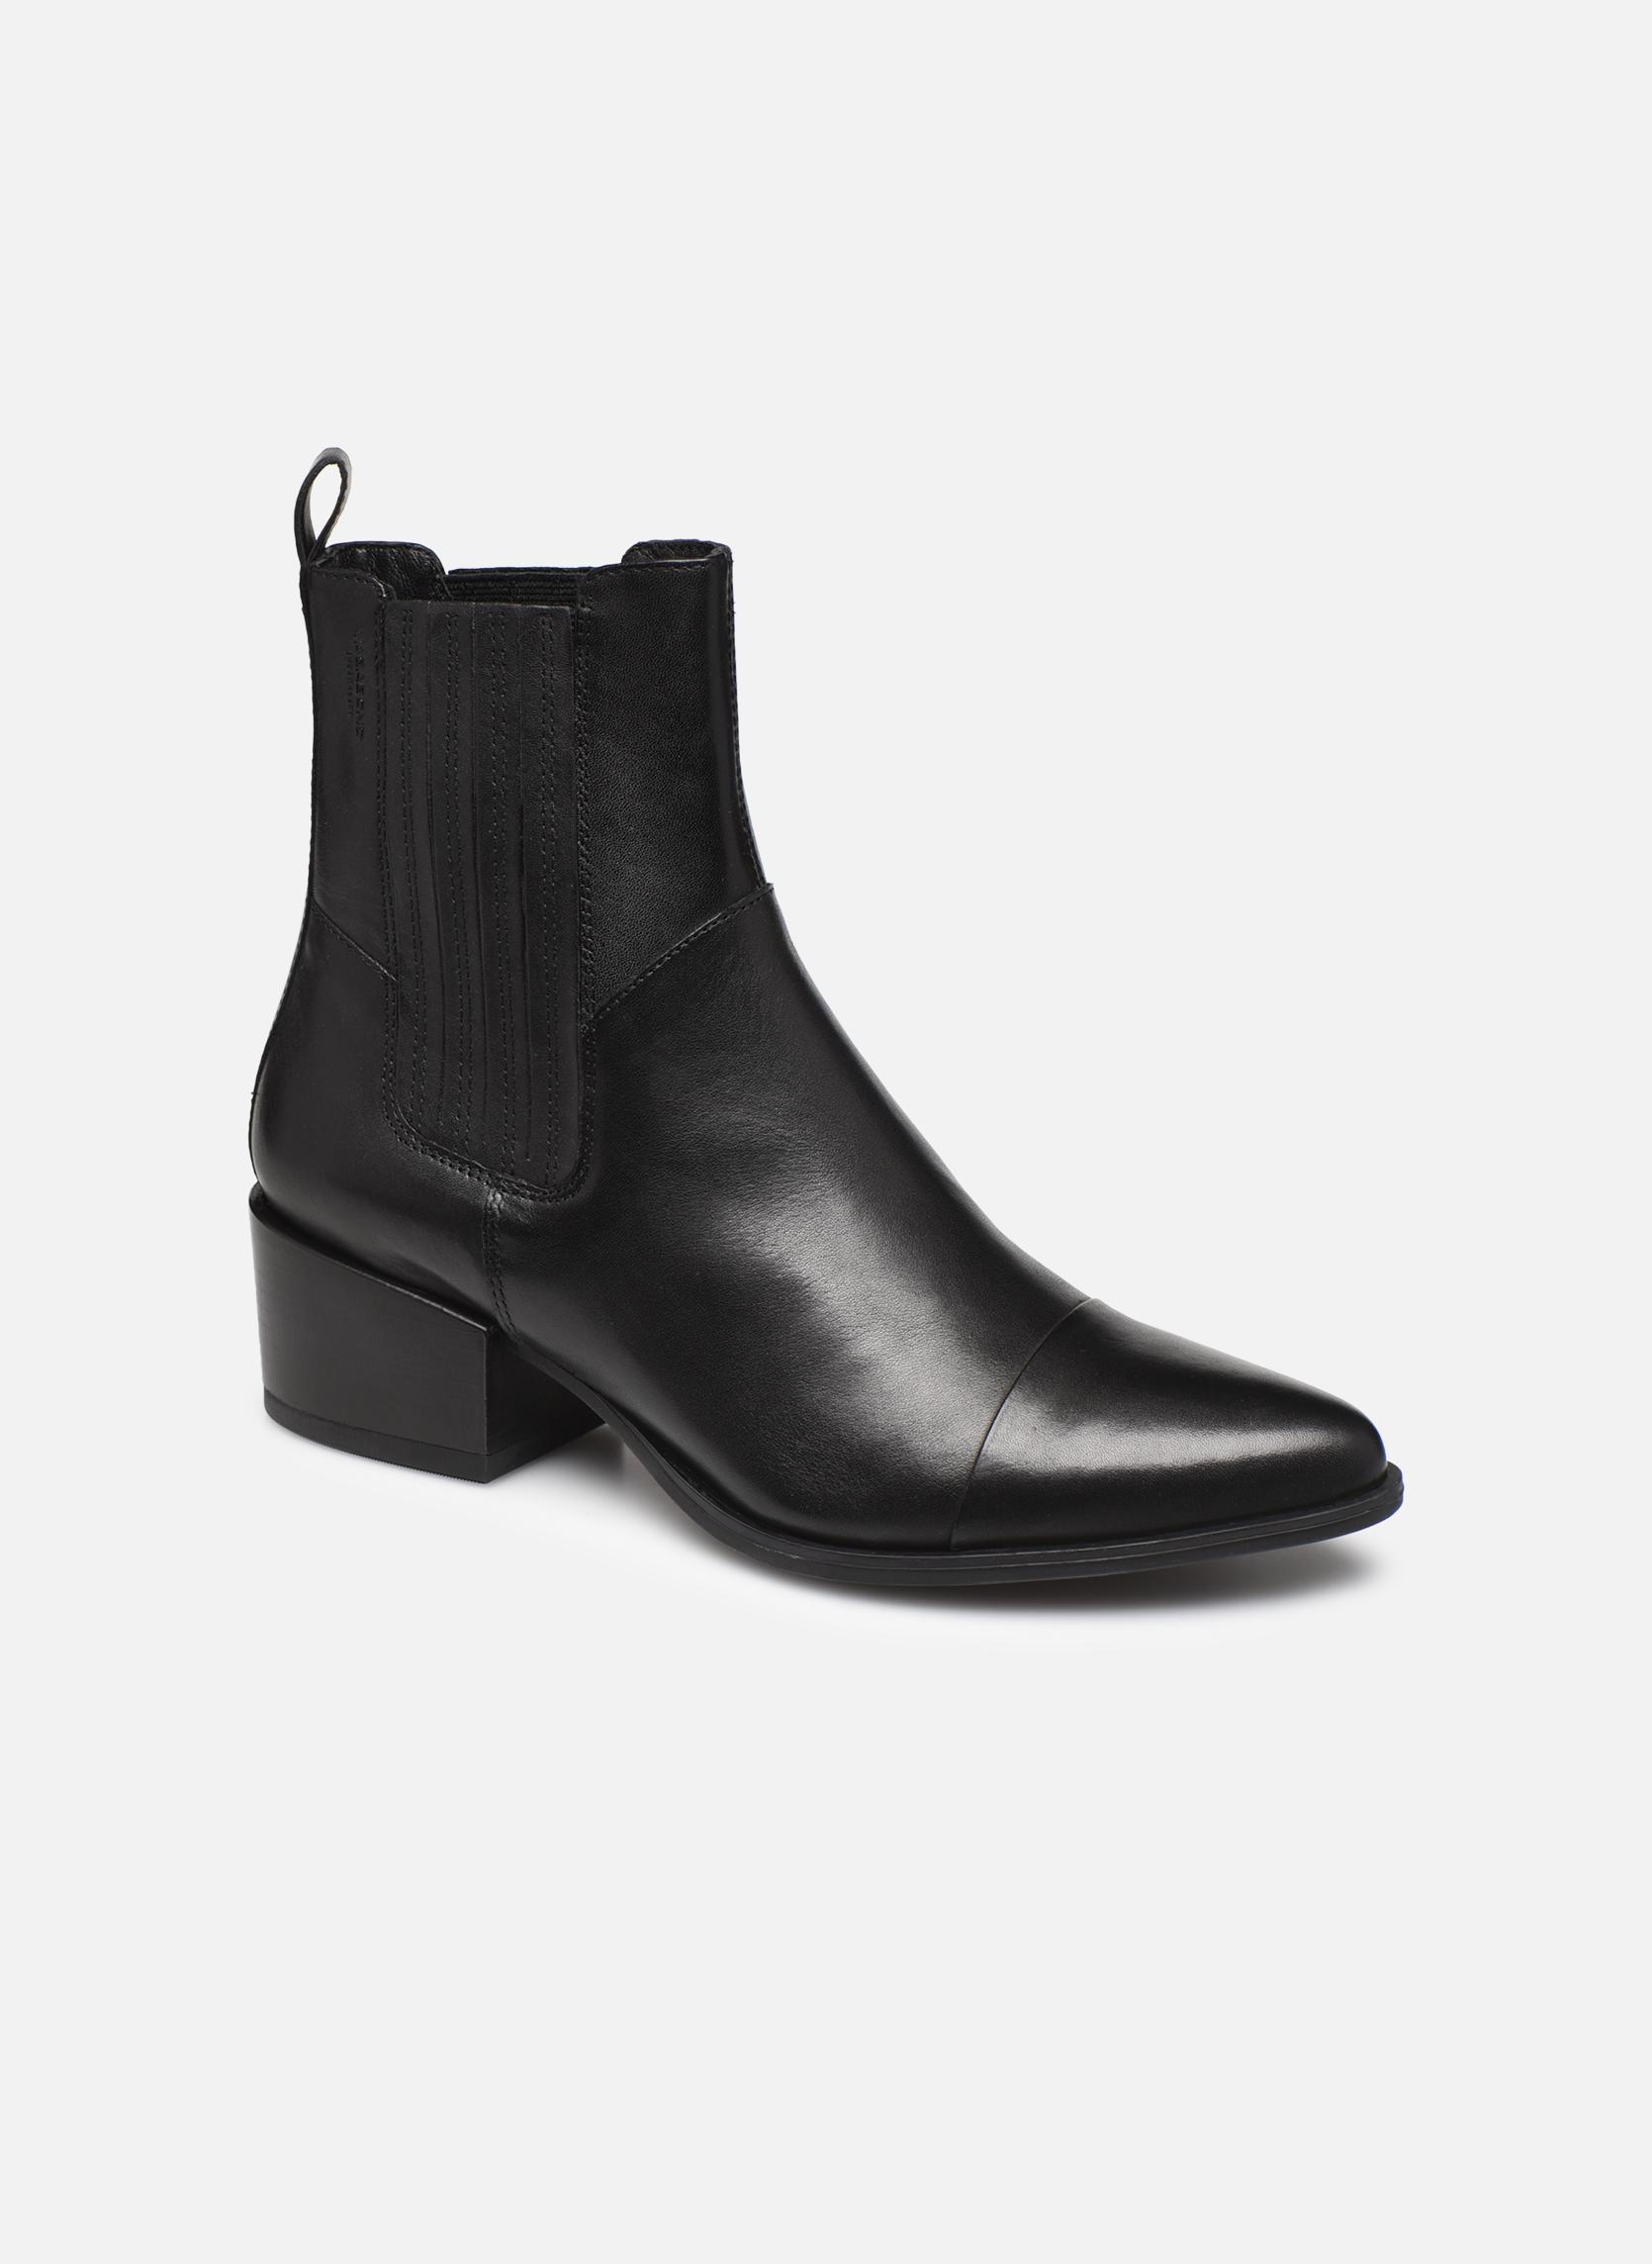 Bottines et boots Femme Marja 4013-401